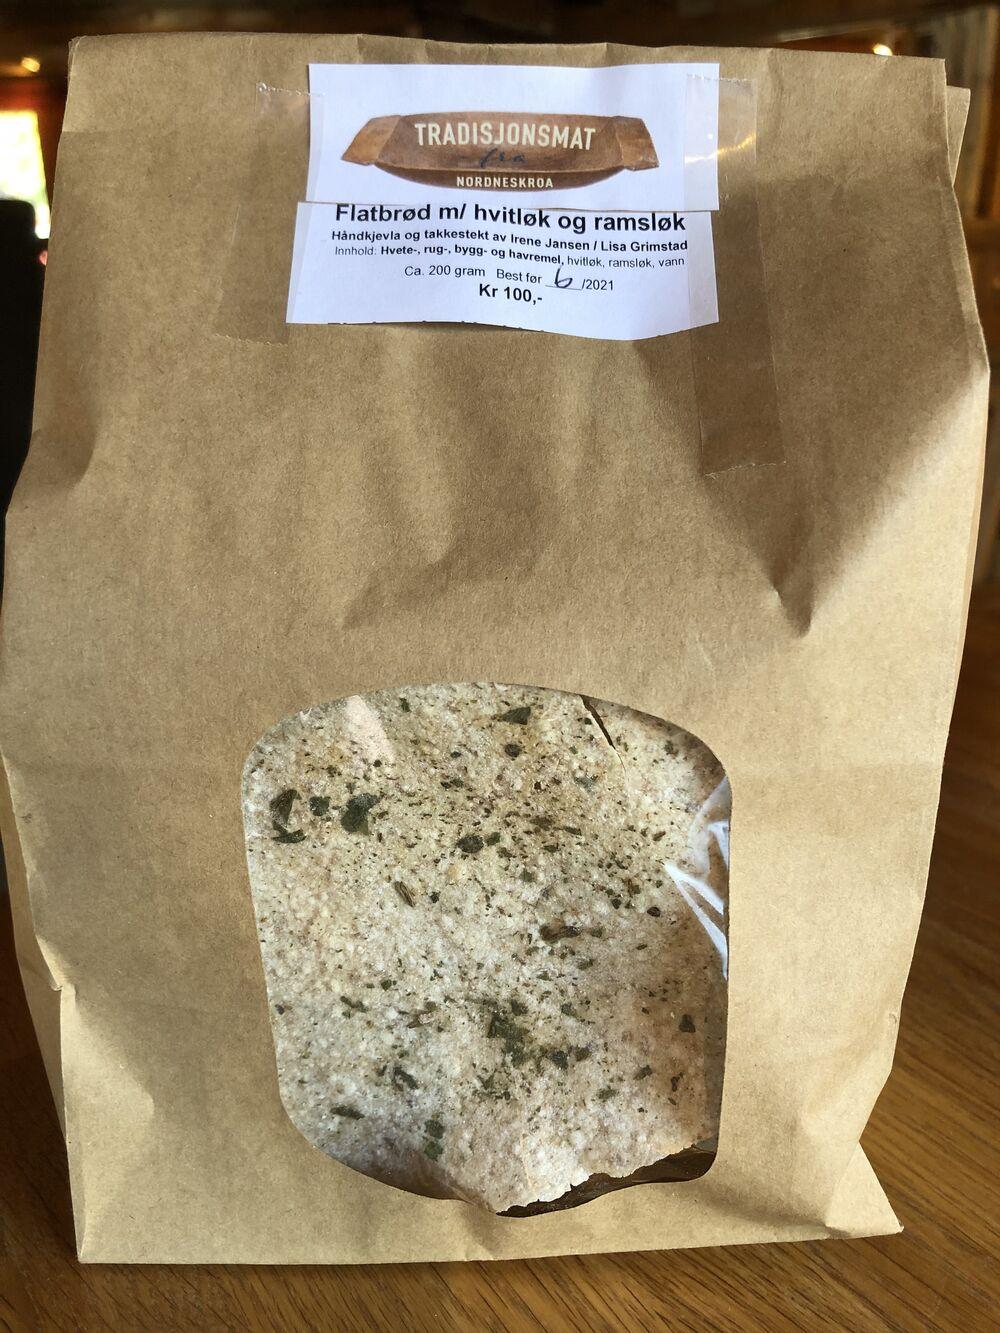 Flatbrød med Ramsløk og hvitløk